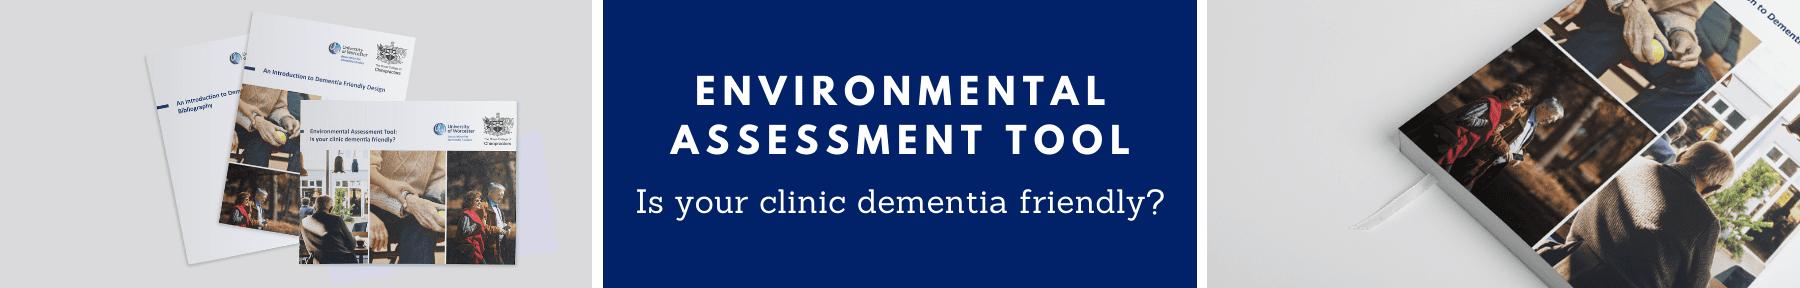 dementia friendly, assessment tool